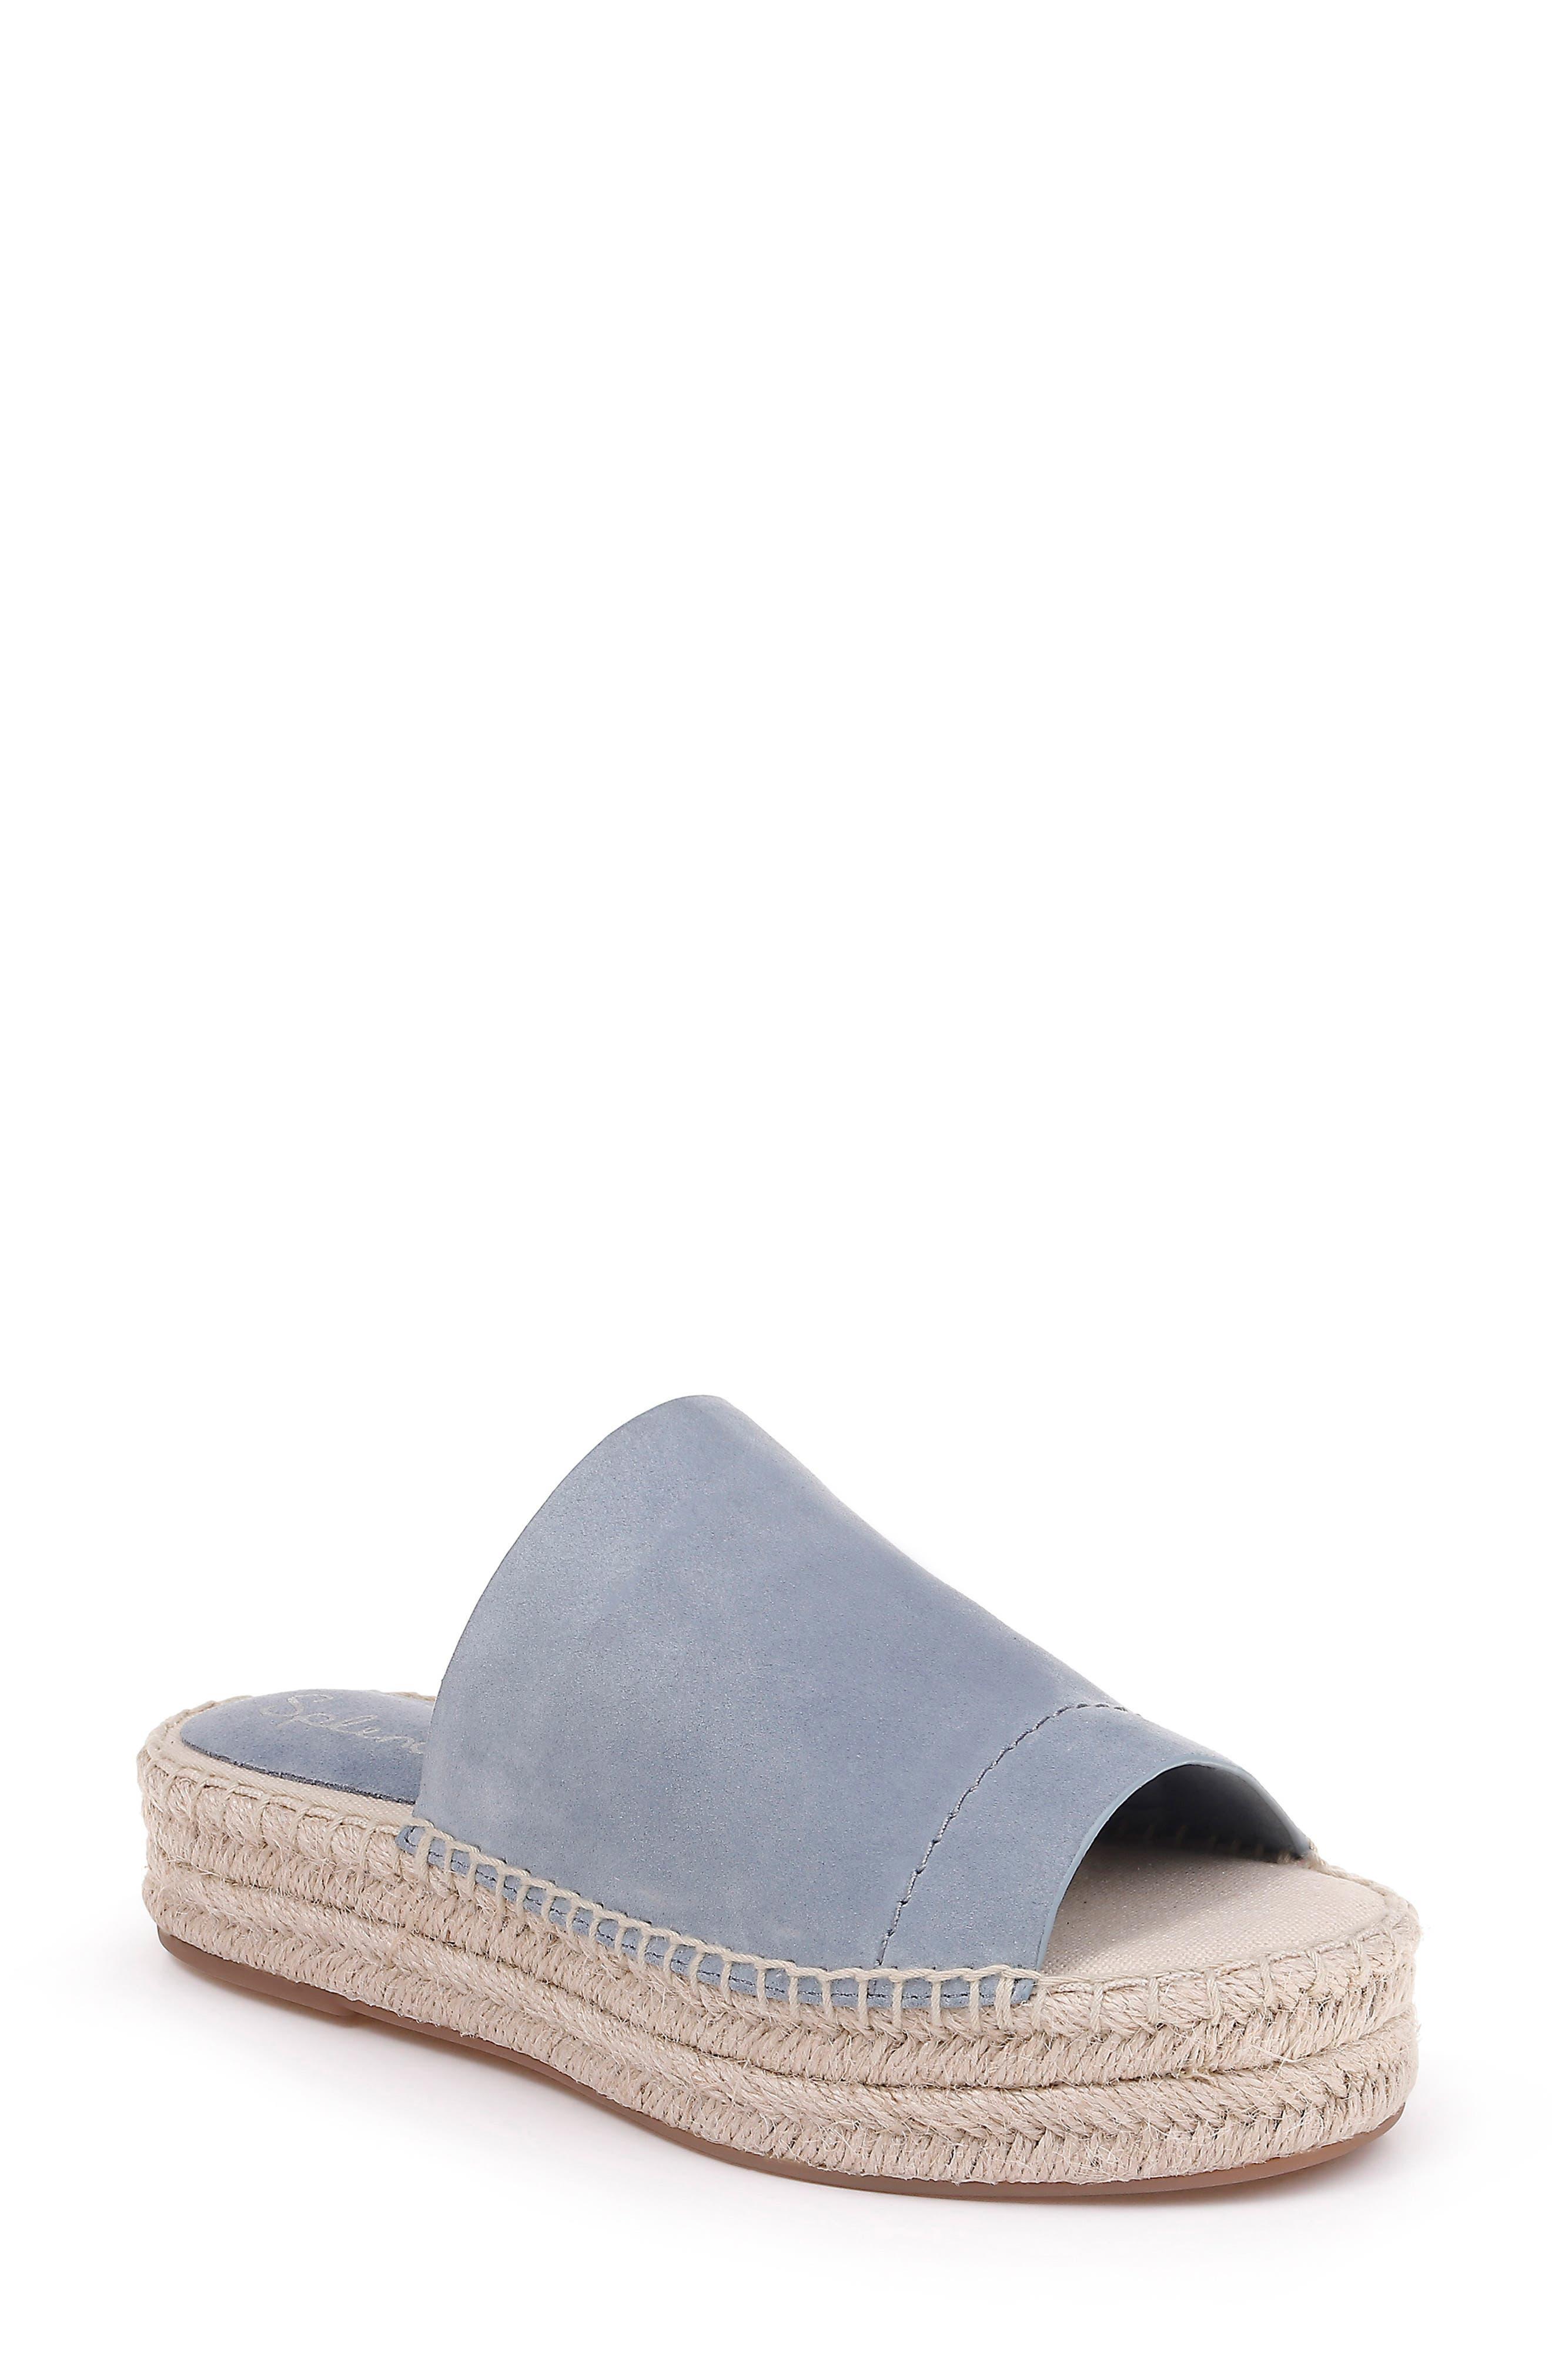 Thaddeus Espadrille Slide Sandal, Main, color, LIGHT BLUE SUEDE